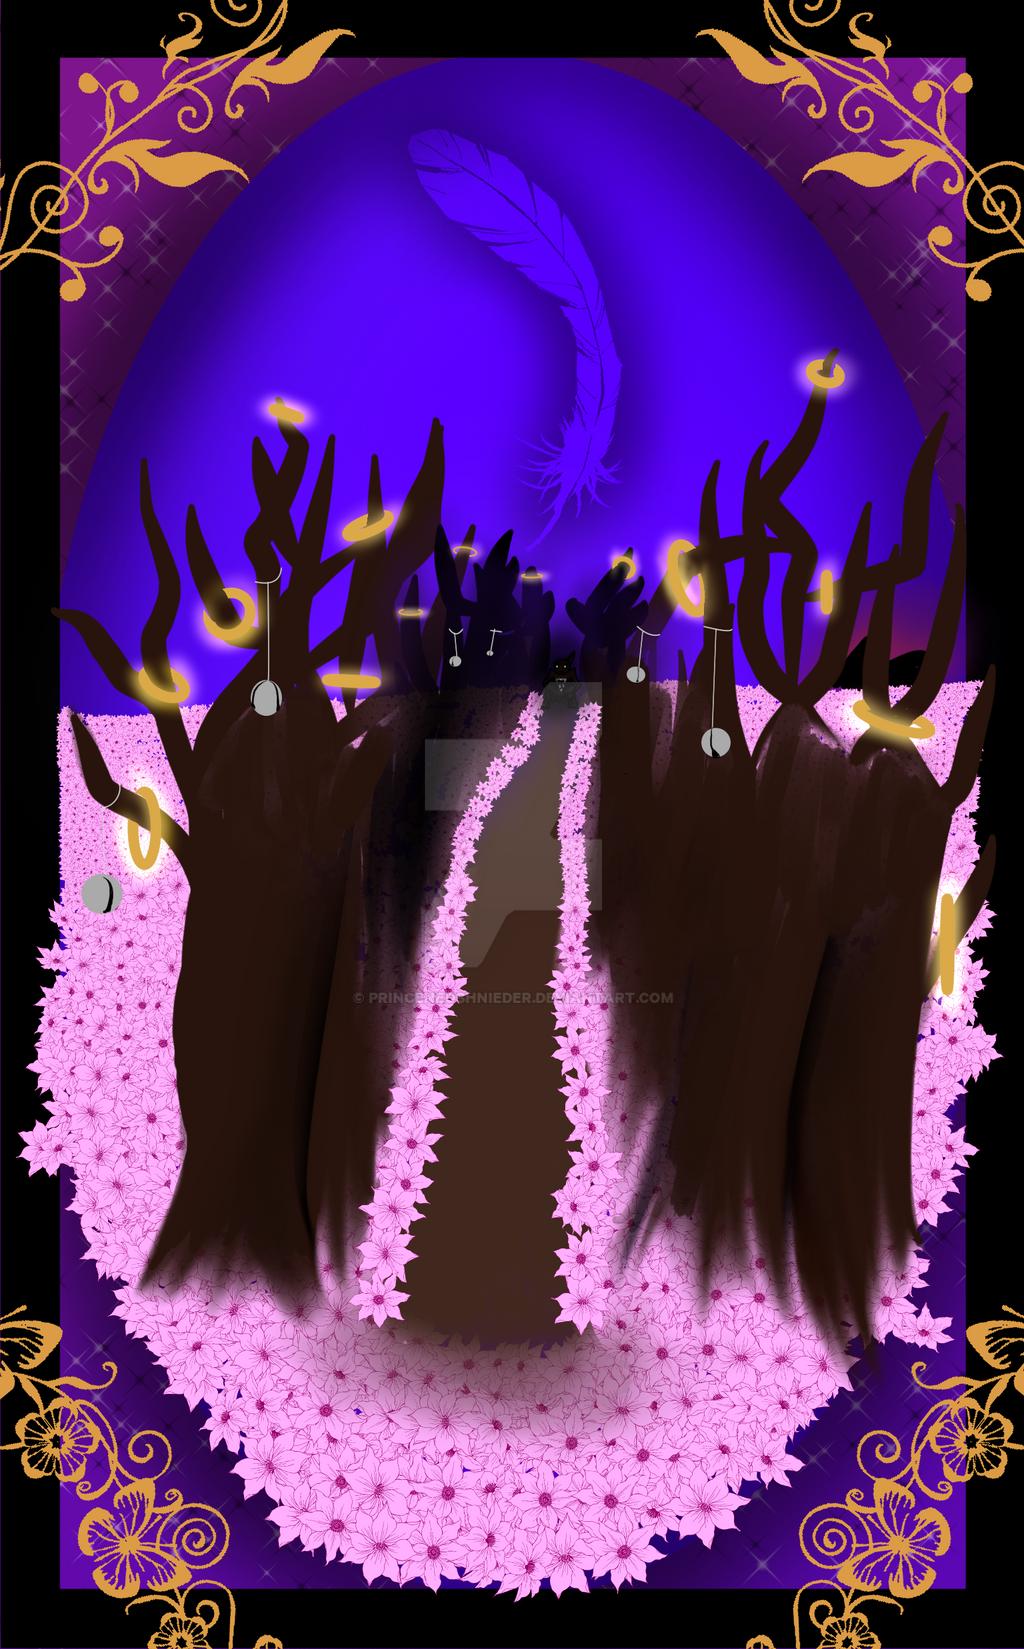 Nexus Realm Card by PrinceNeoShnieder